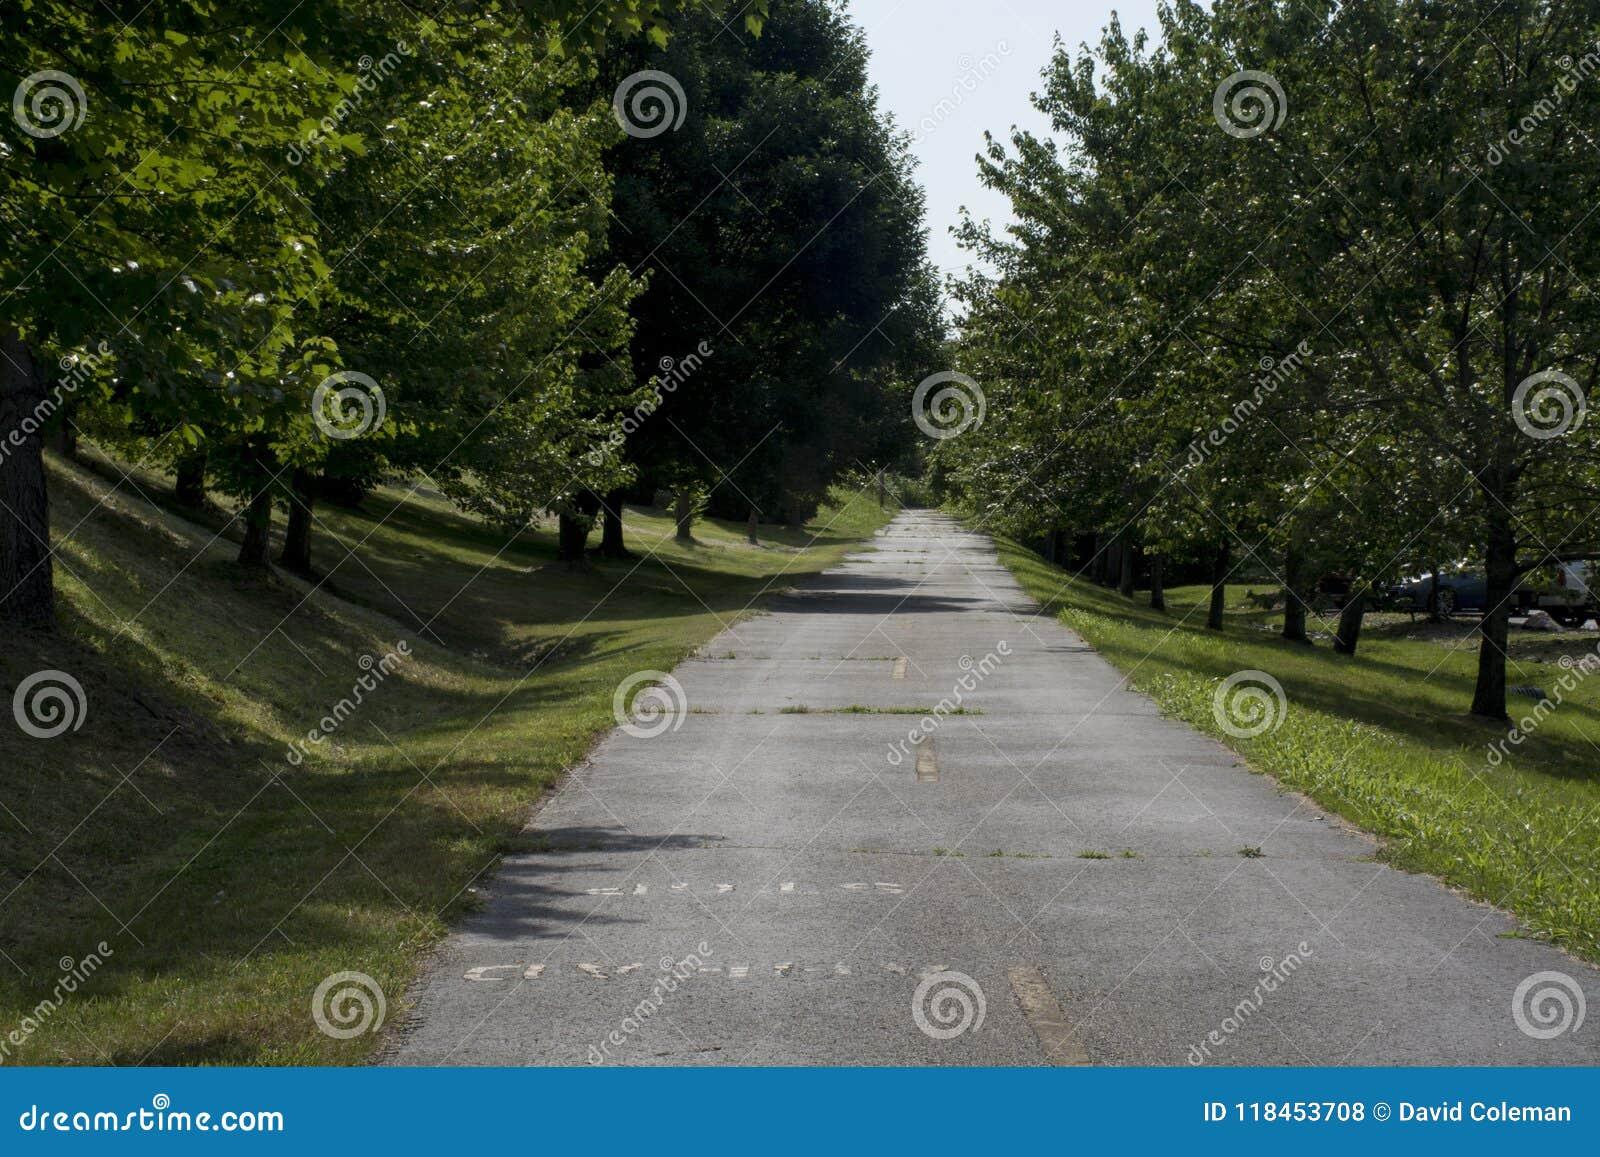 Träd fodrad cykelbana